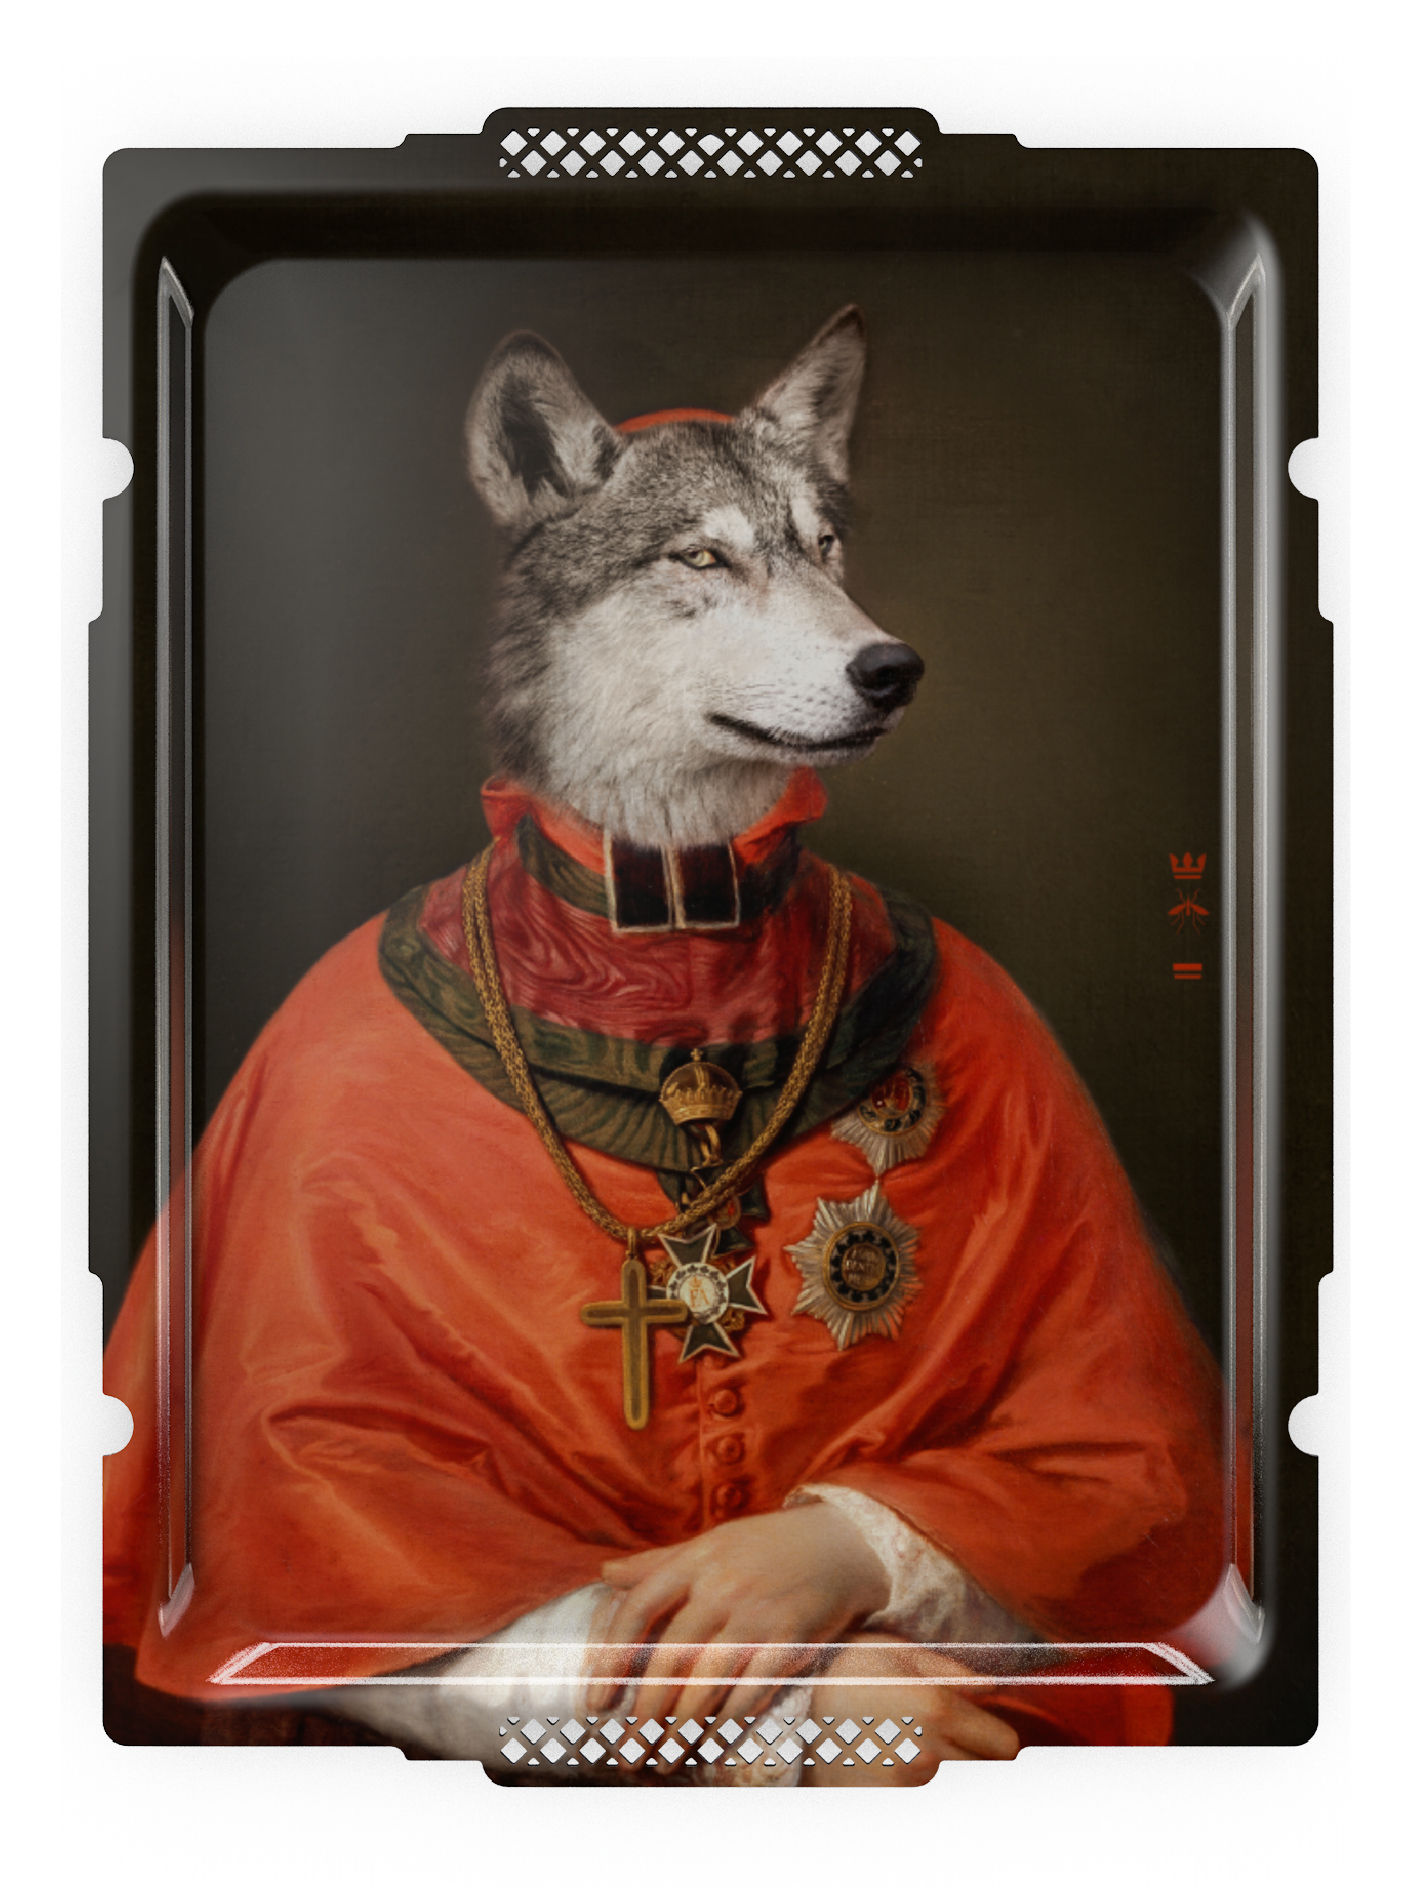 Tavola - Vassoi  - Piano/vassoio Le loup et l'Agneau di Ibride - Lupo - Laminato massello